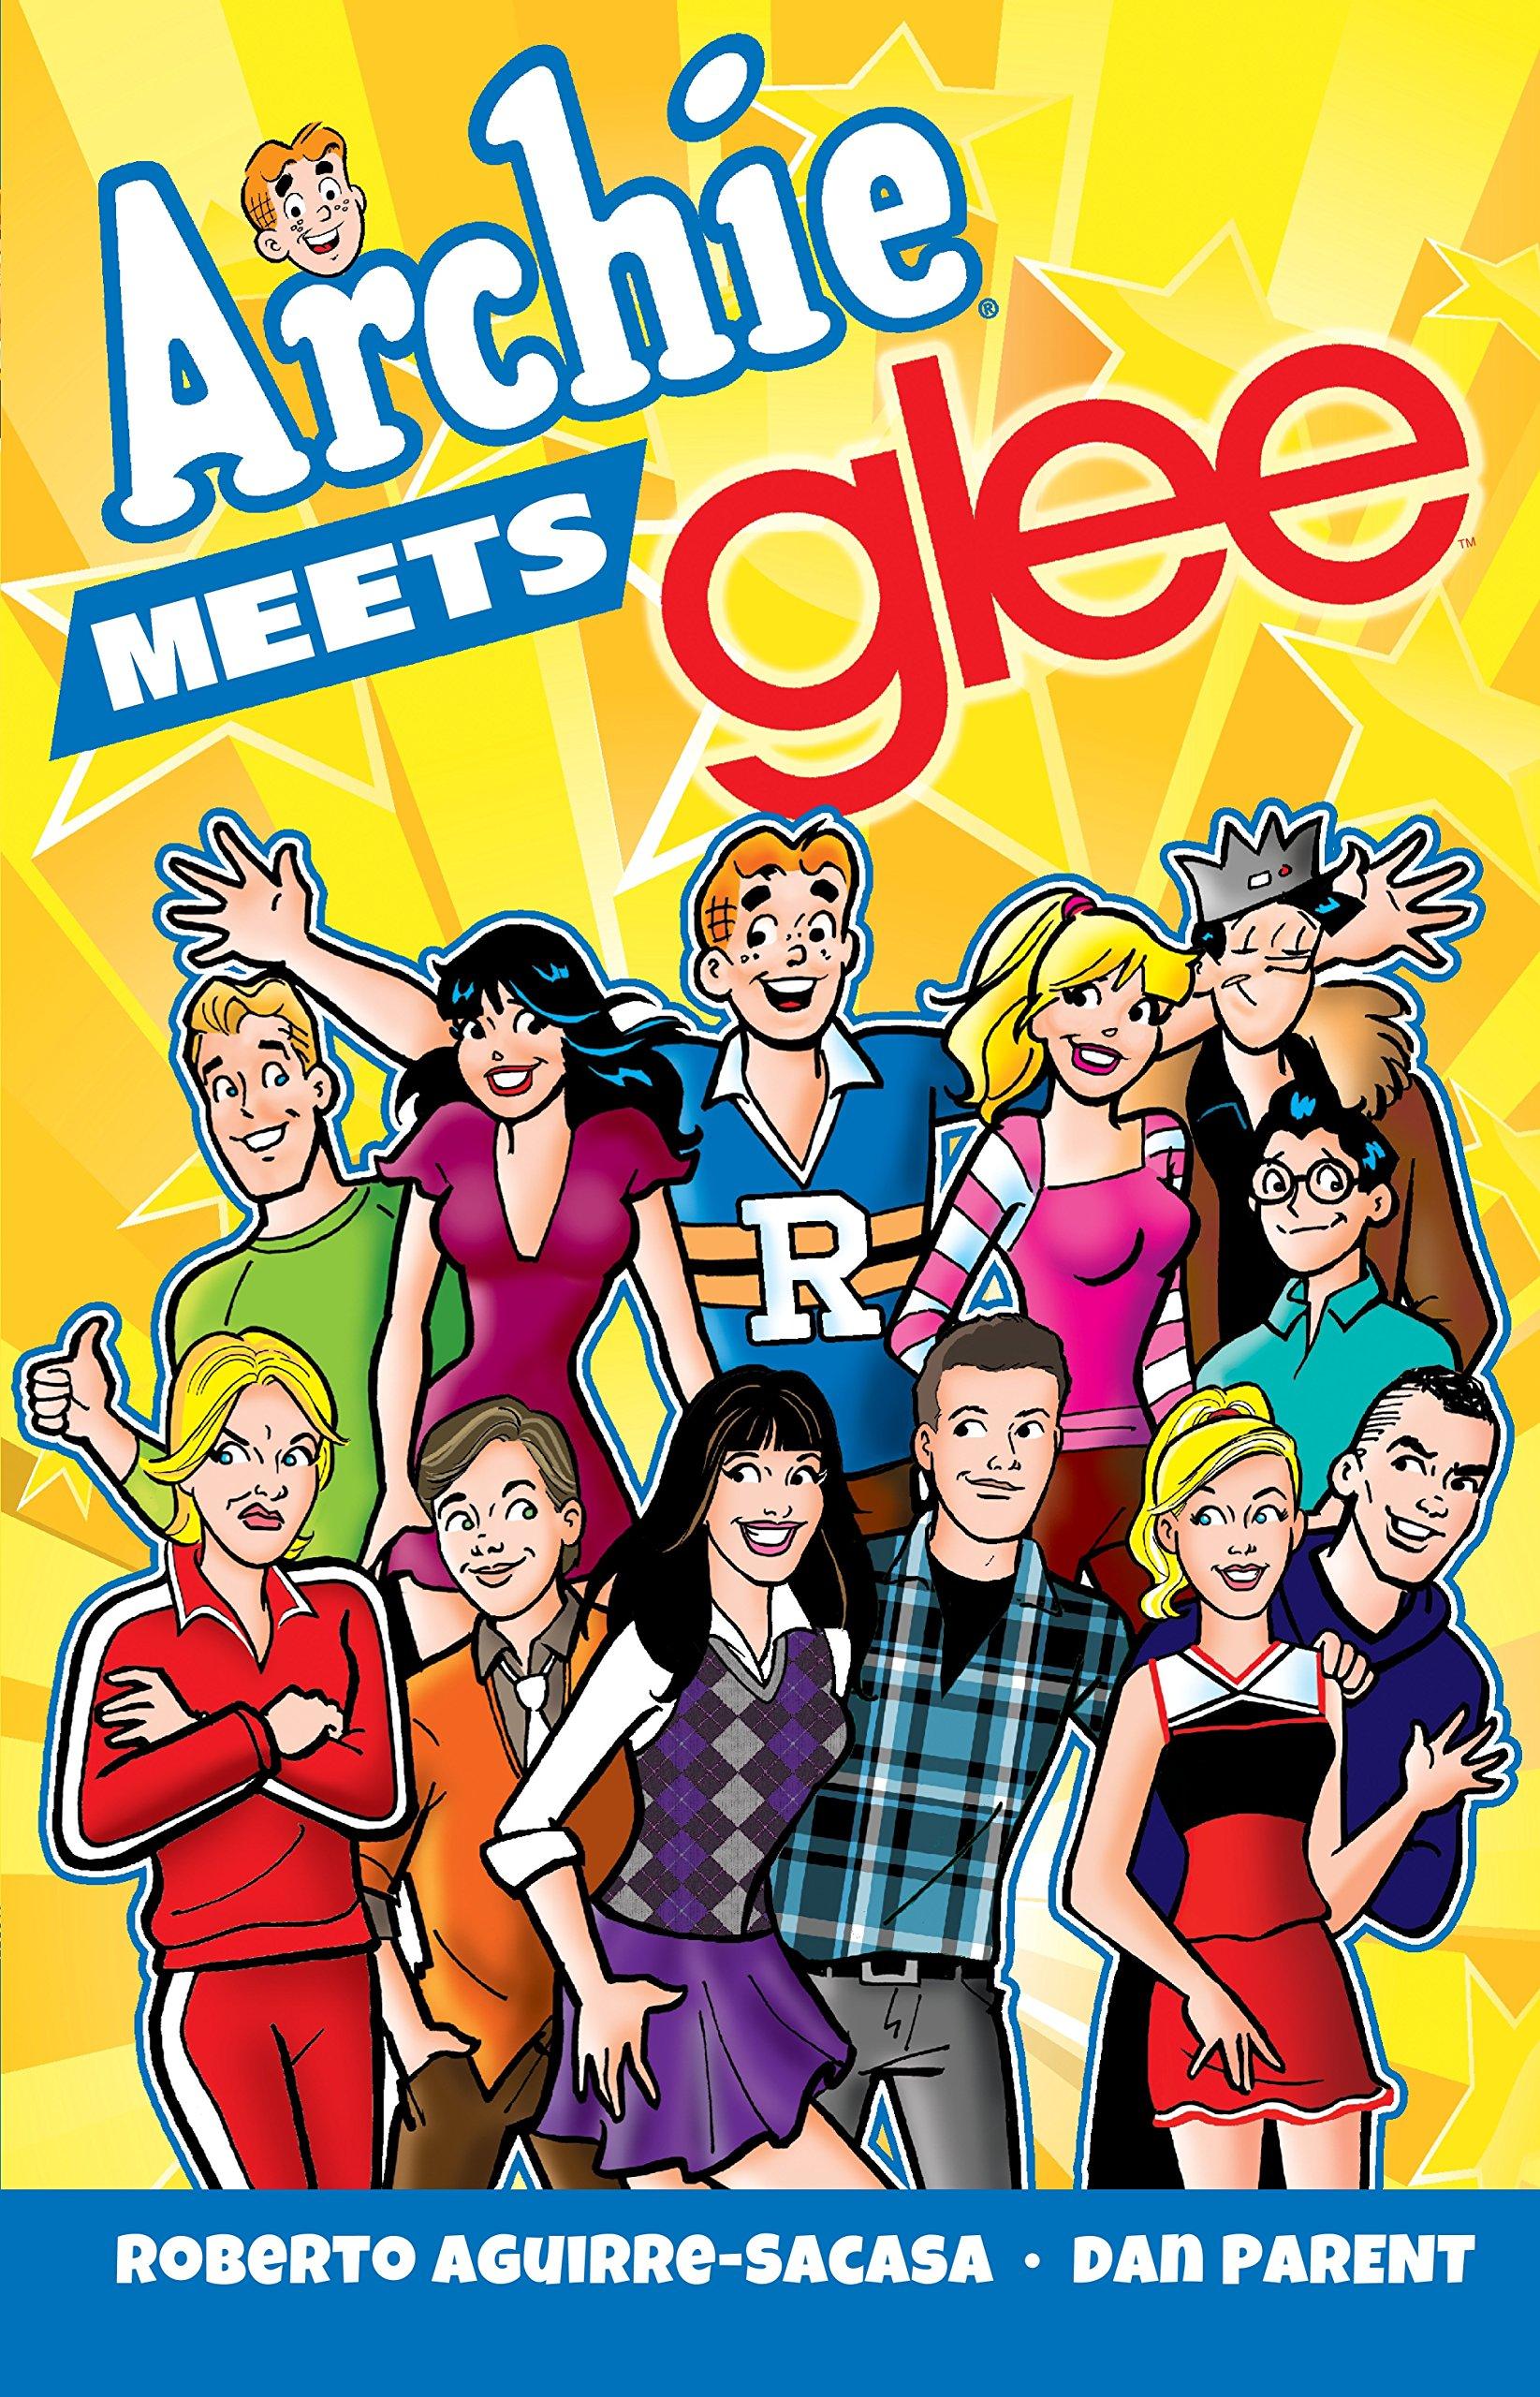 Amazon.com: Archie Meets Glee (Archie & Friends All-Stars) (9781936975457):  Roberto Aguirre-Sacasa, Dan Parent: Books